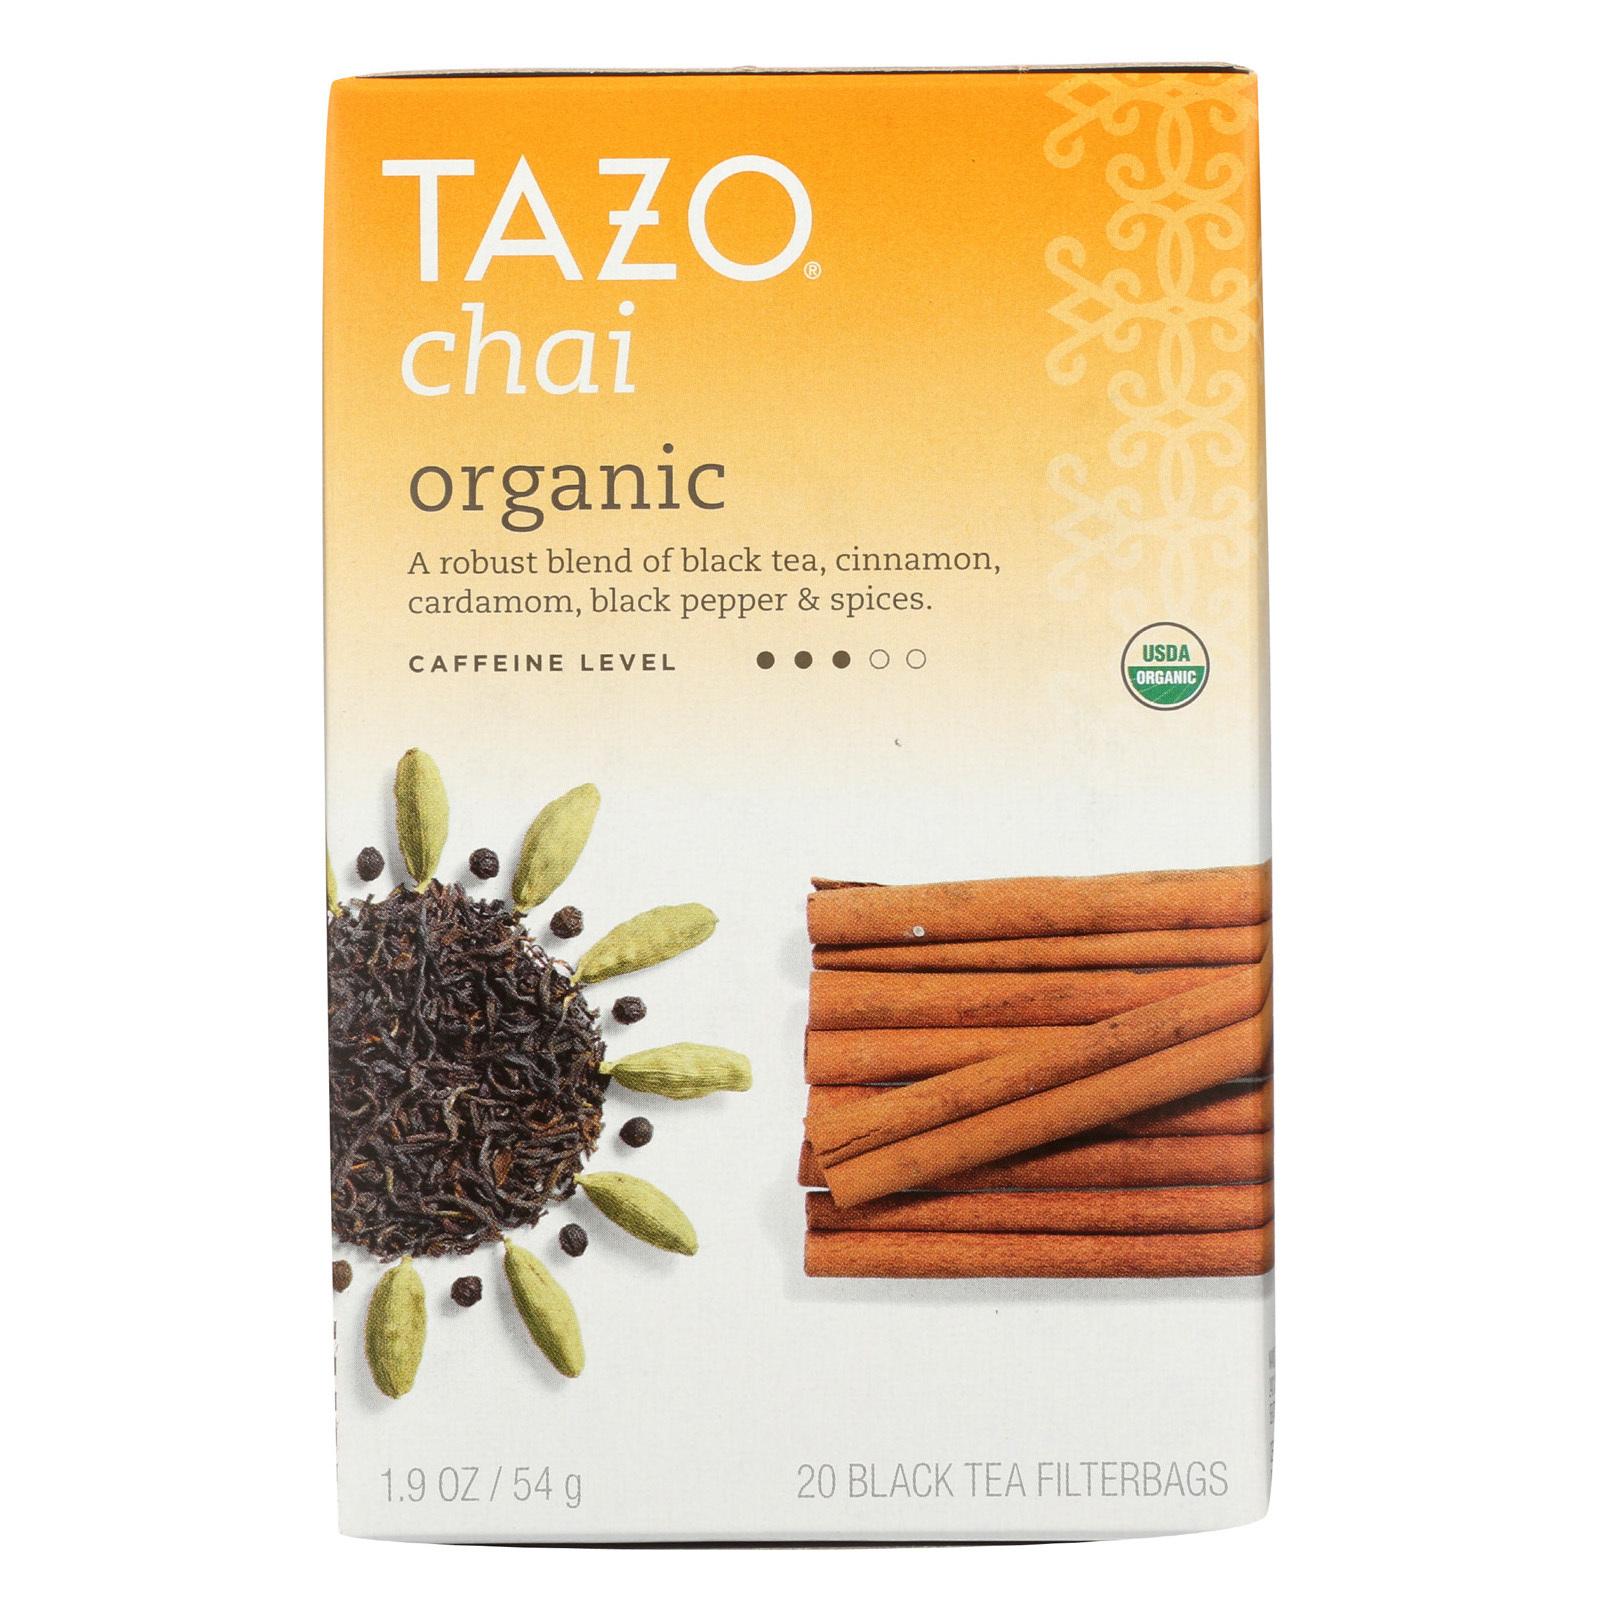 Tazo Tea Organic Tea - Spiced Black Chai - Case of 6 - 20 BAG